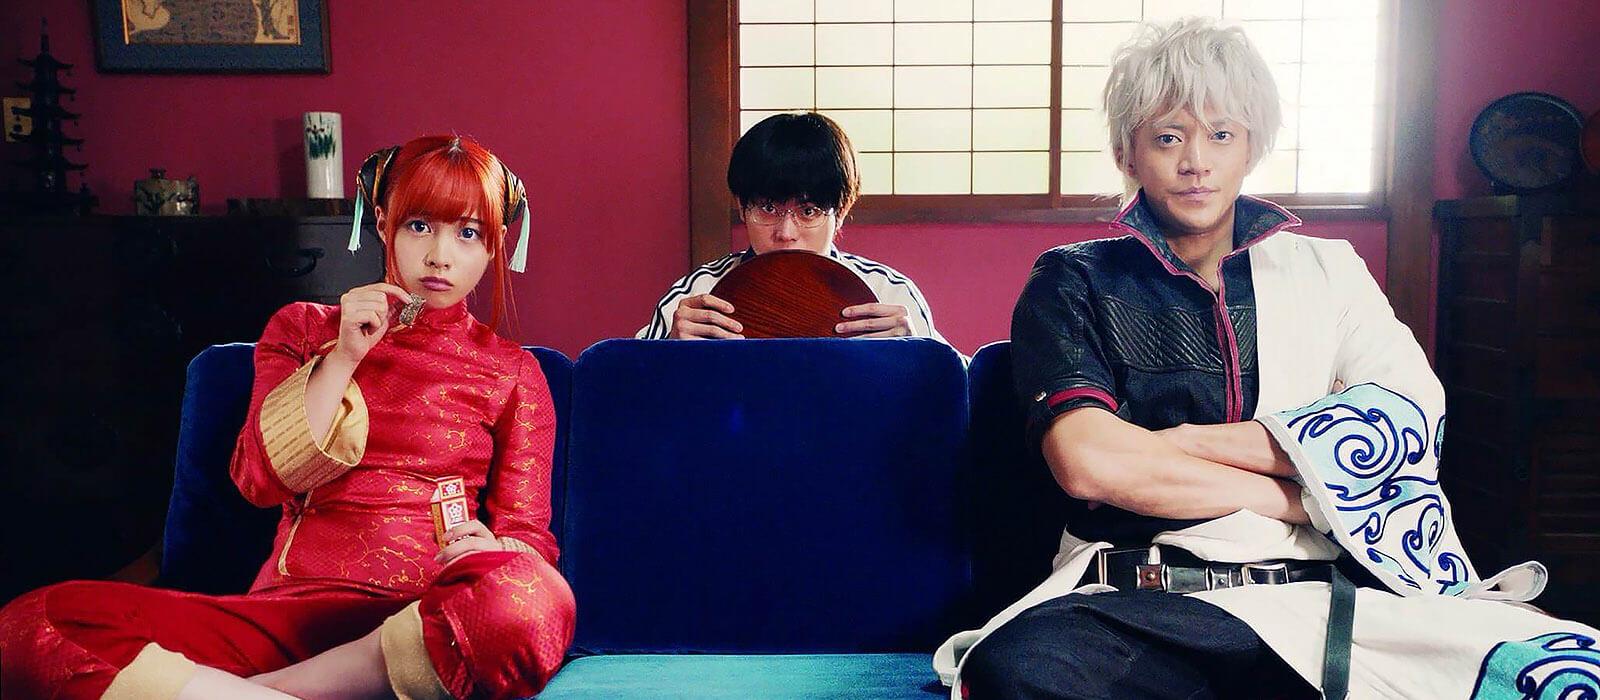 Yorozuya cast in Gintama live-action